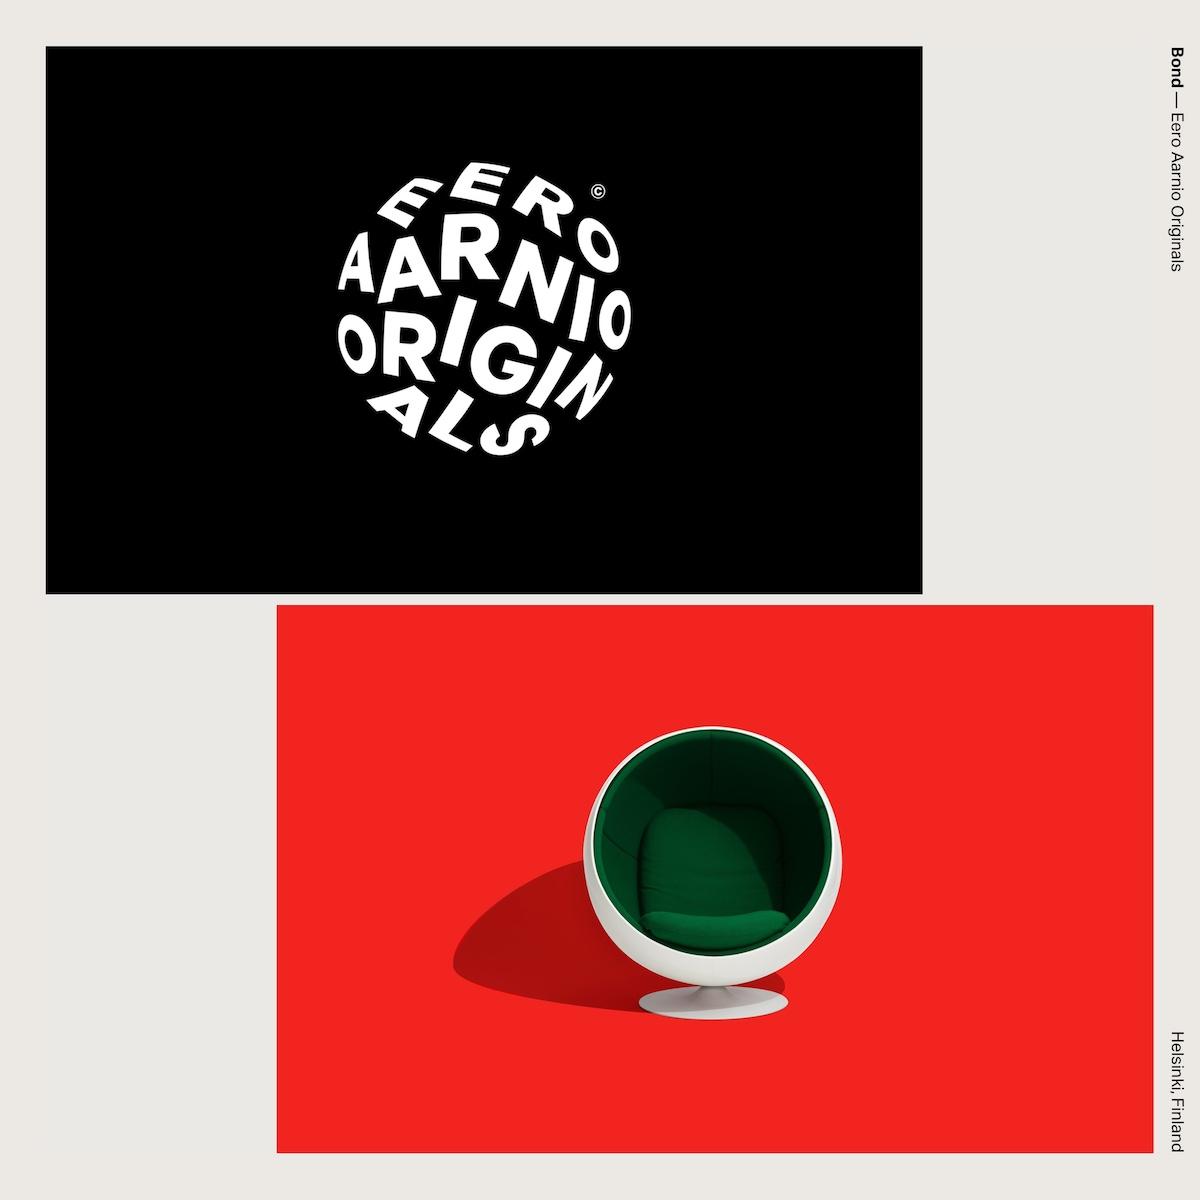 Bond — Eero Aarnio Originals